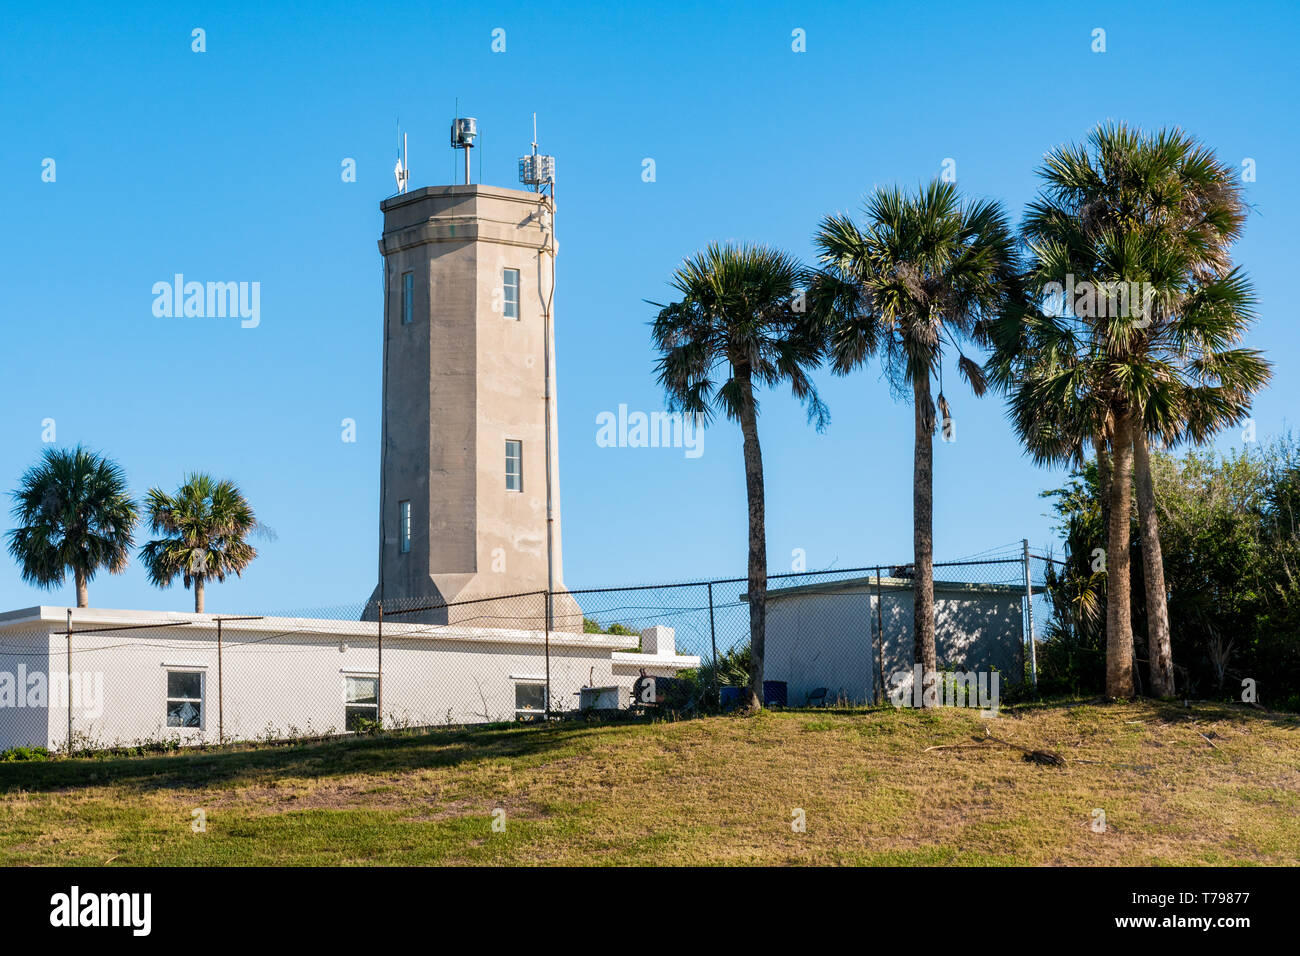 St Johns Lighthouse, Naval Station Mayport, Florida - Stock Image